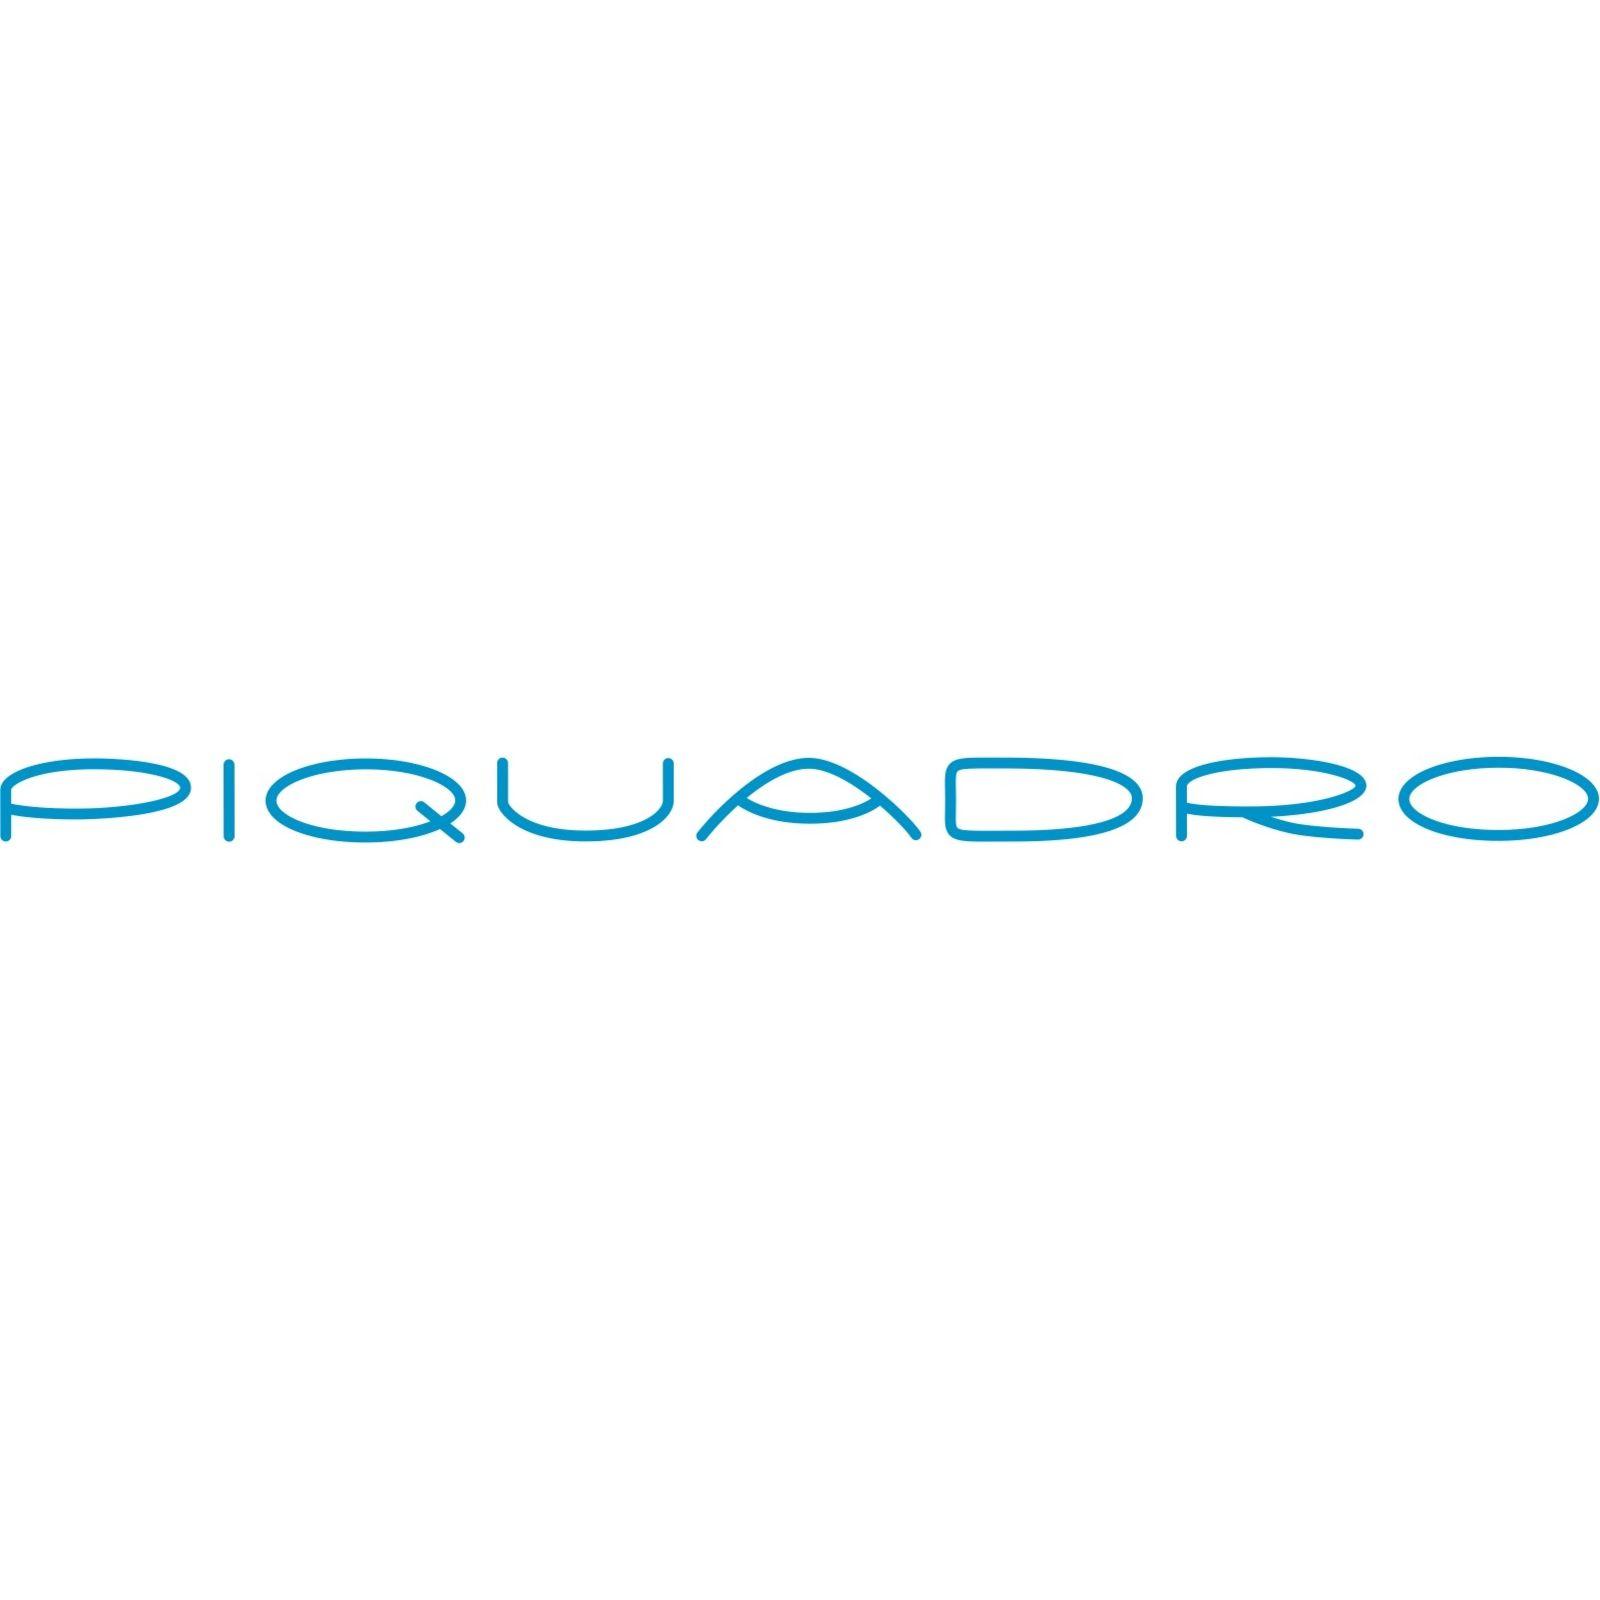 PIQUADRO (Image 1)